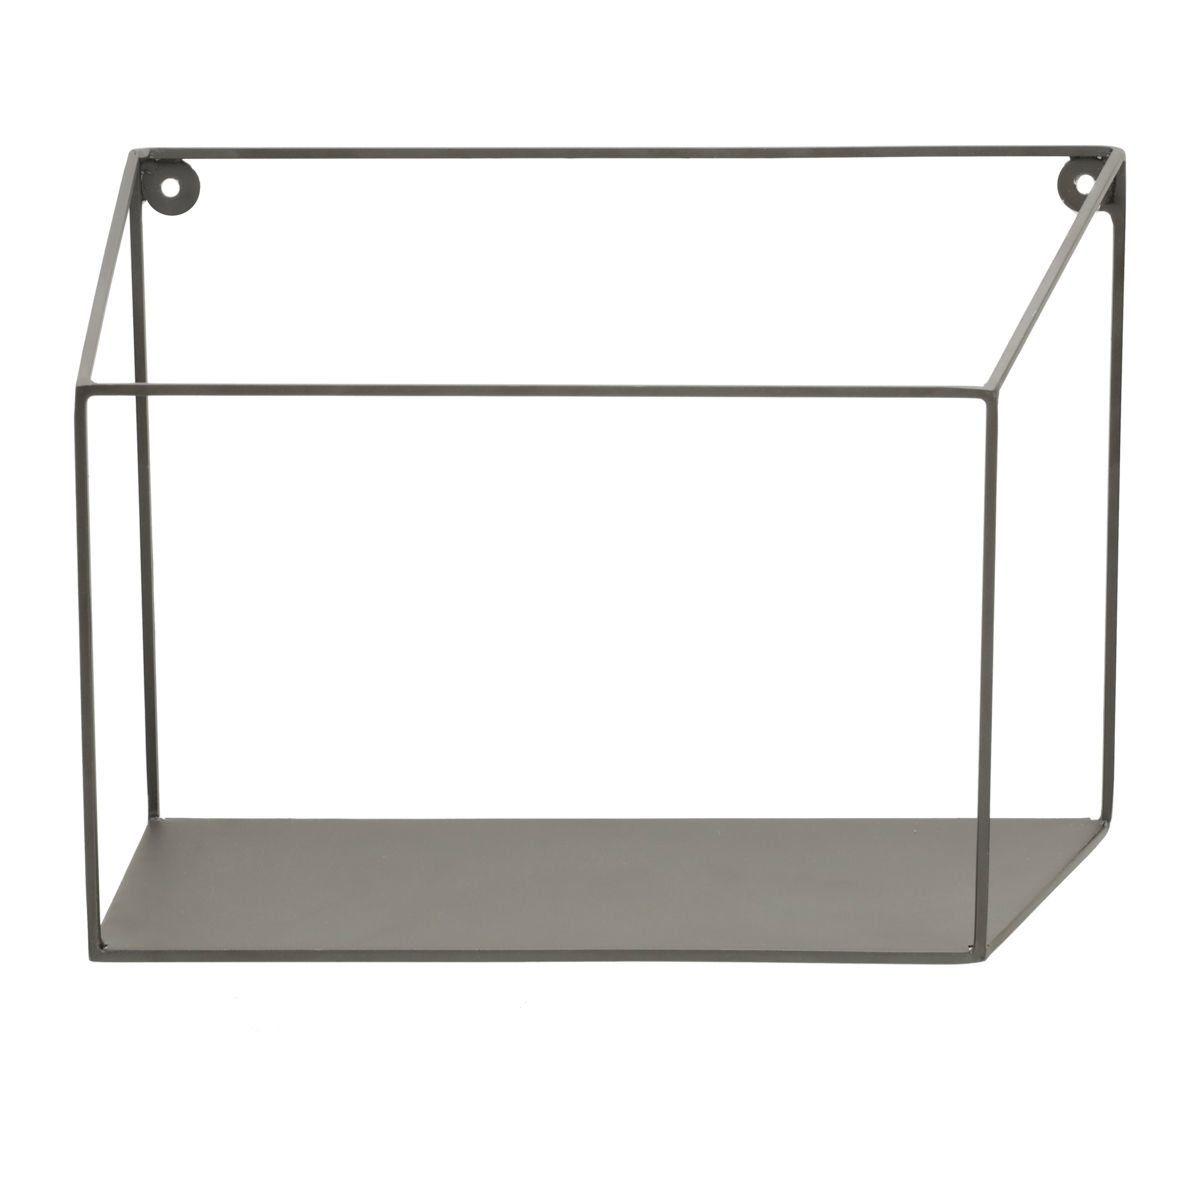 Prateleira de Metal Geométrica Preto 20cm x 28cm - 42638